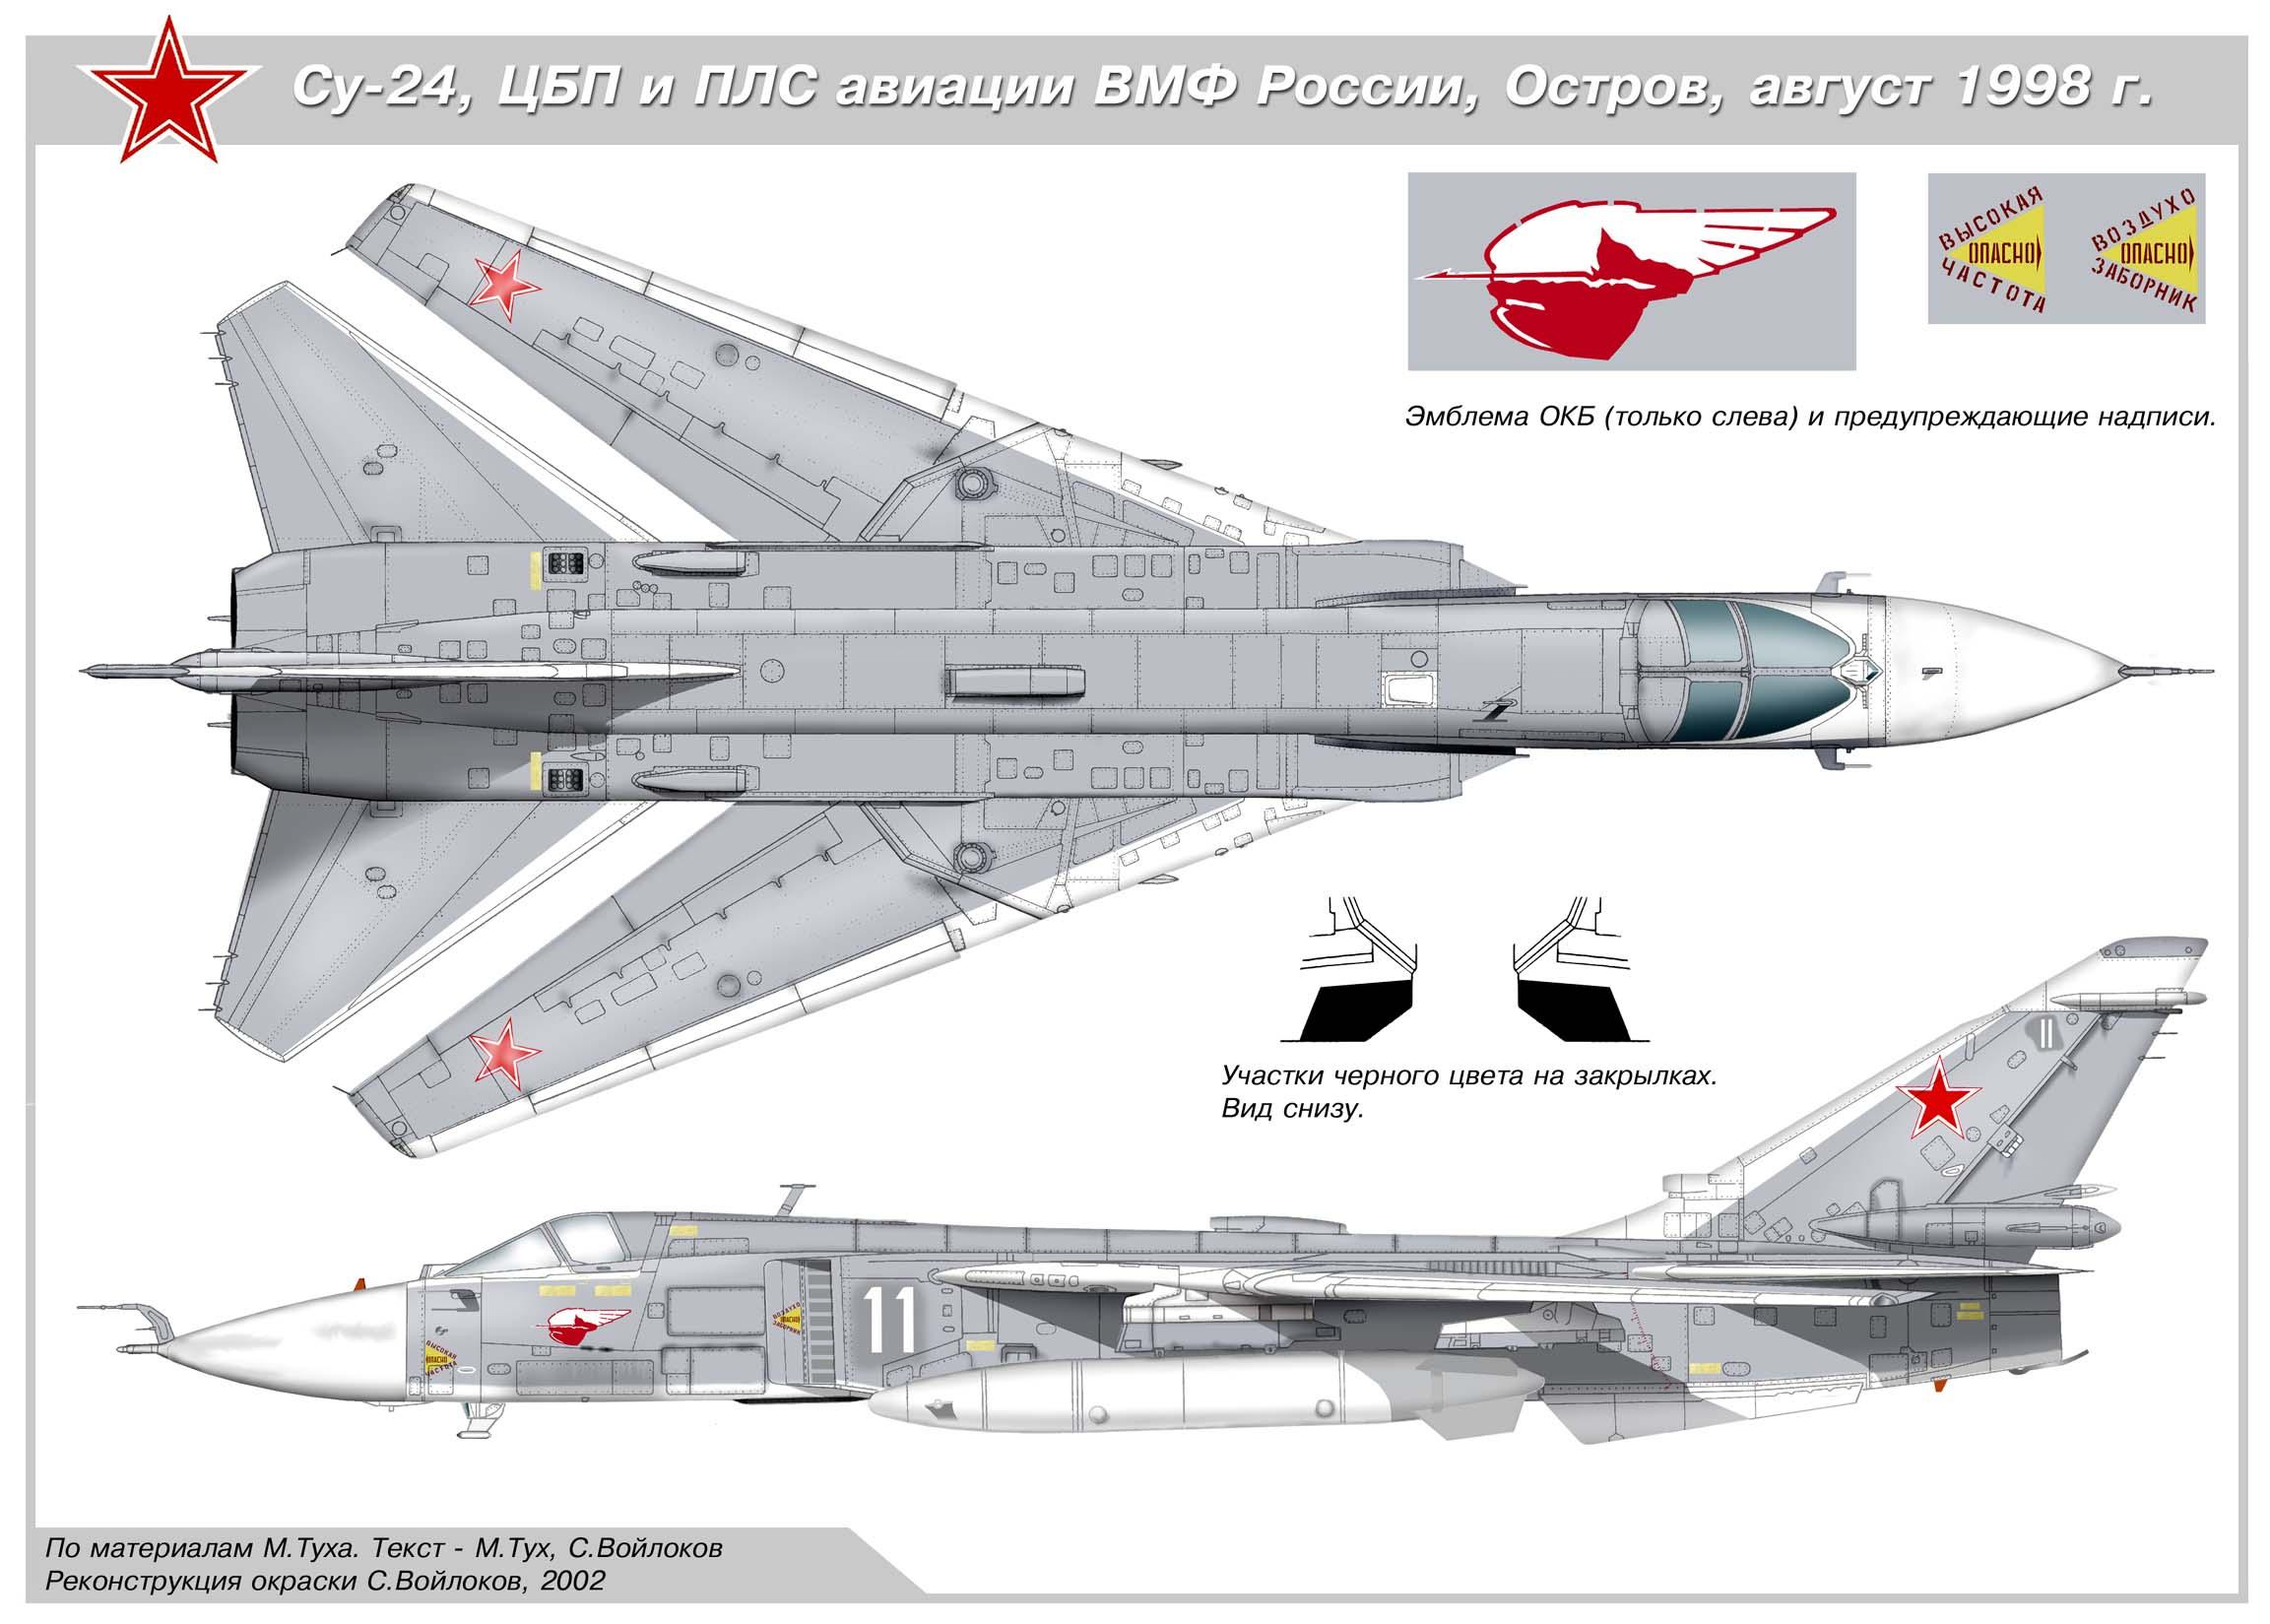 El primer prototipo del bombardero PAK DA estará listo en 2020 Su24-200dpi-2